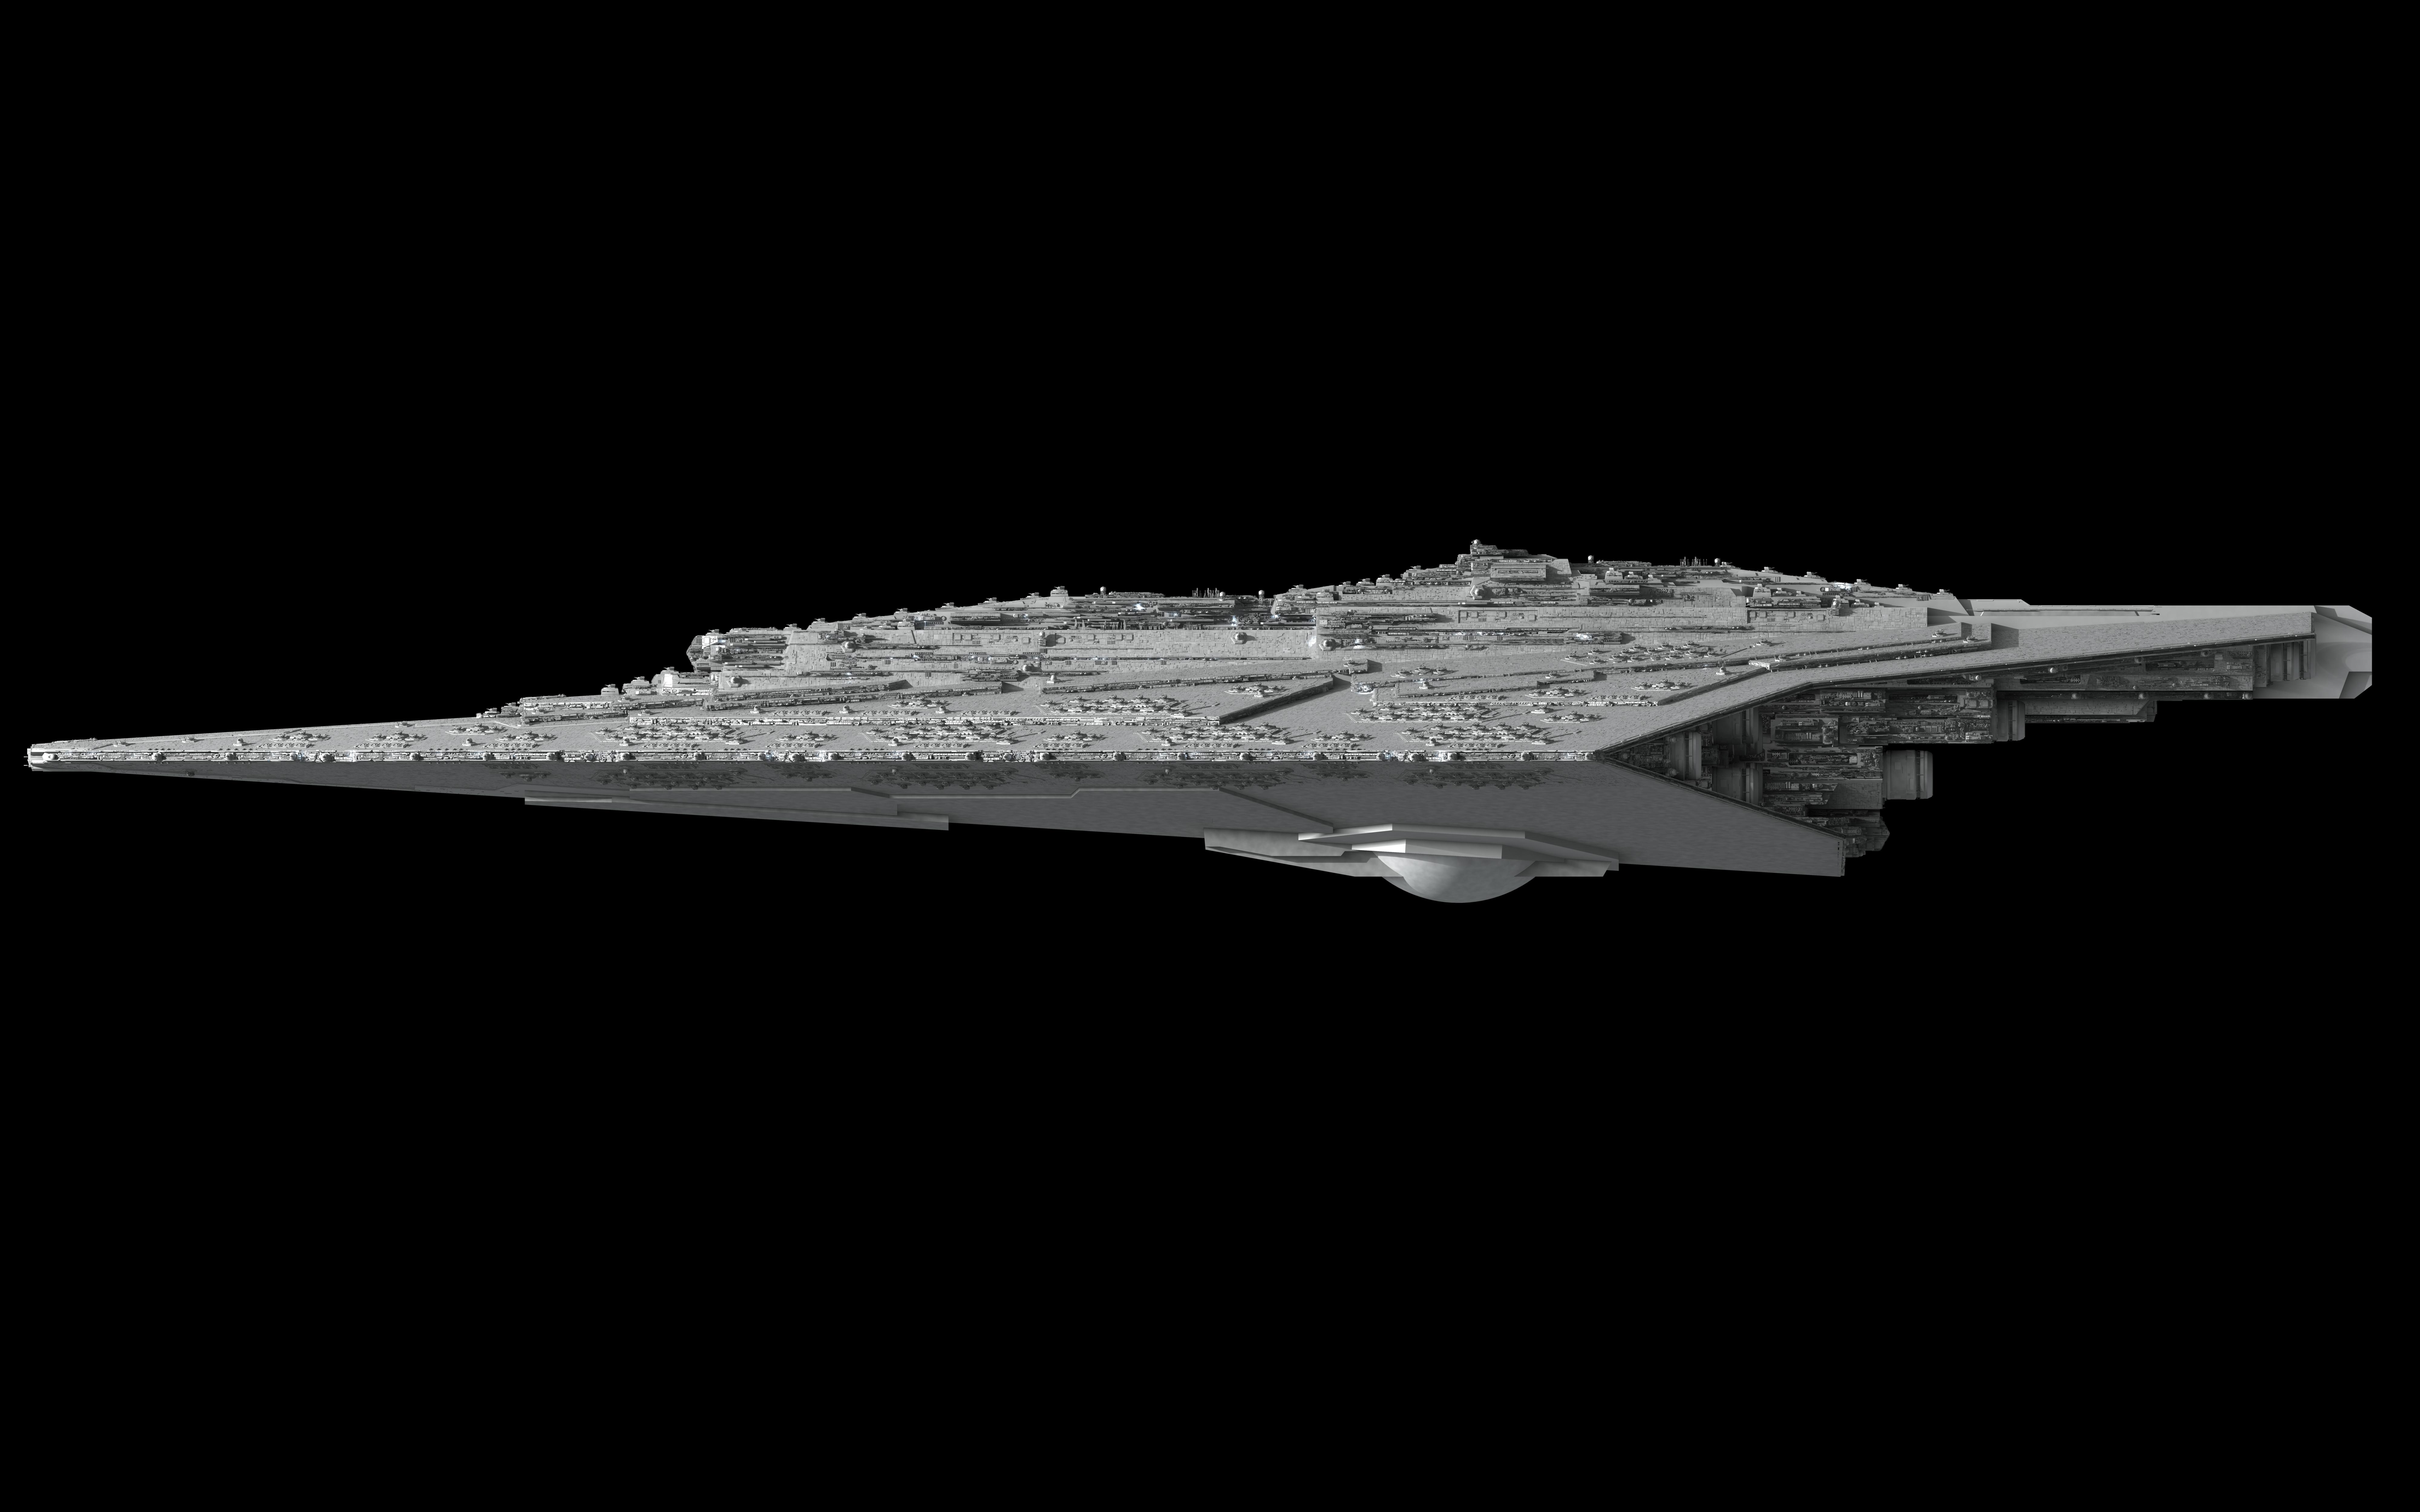 Star wars executor wallpaper for 3d star net